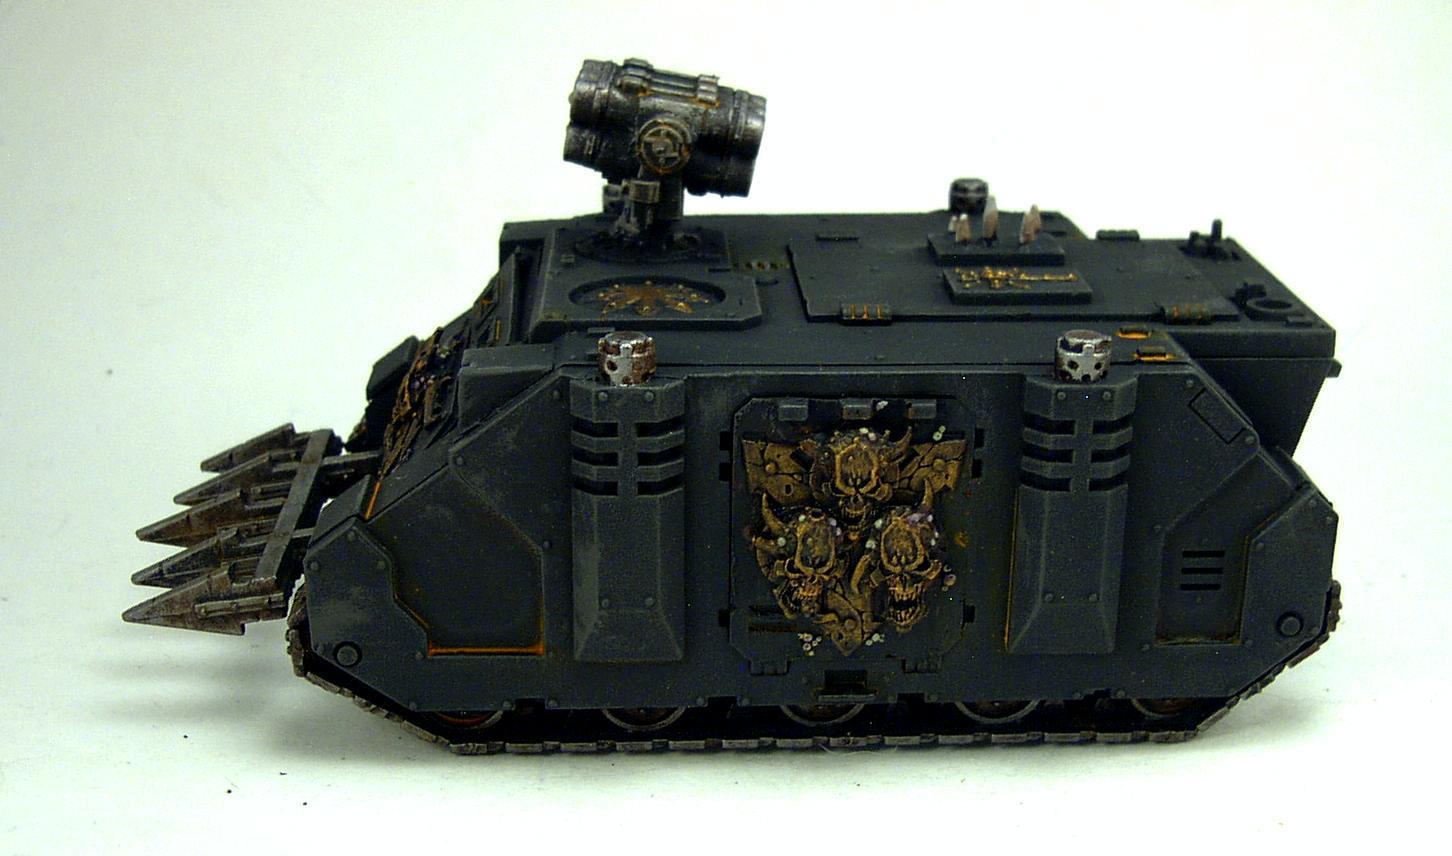 Chaos Space Marines, Rhino, Warhammer 40,000